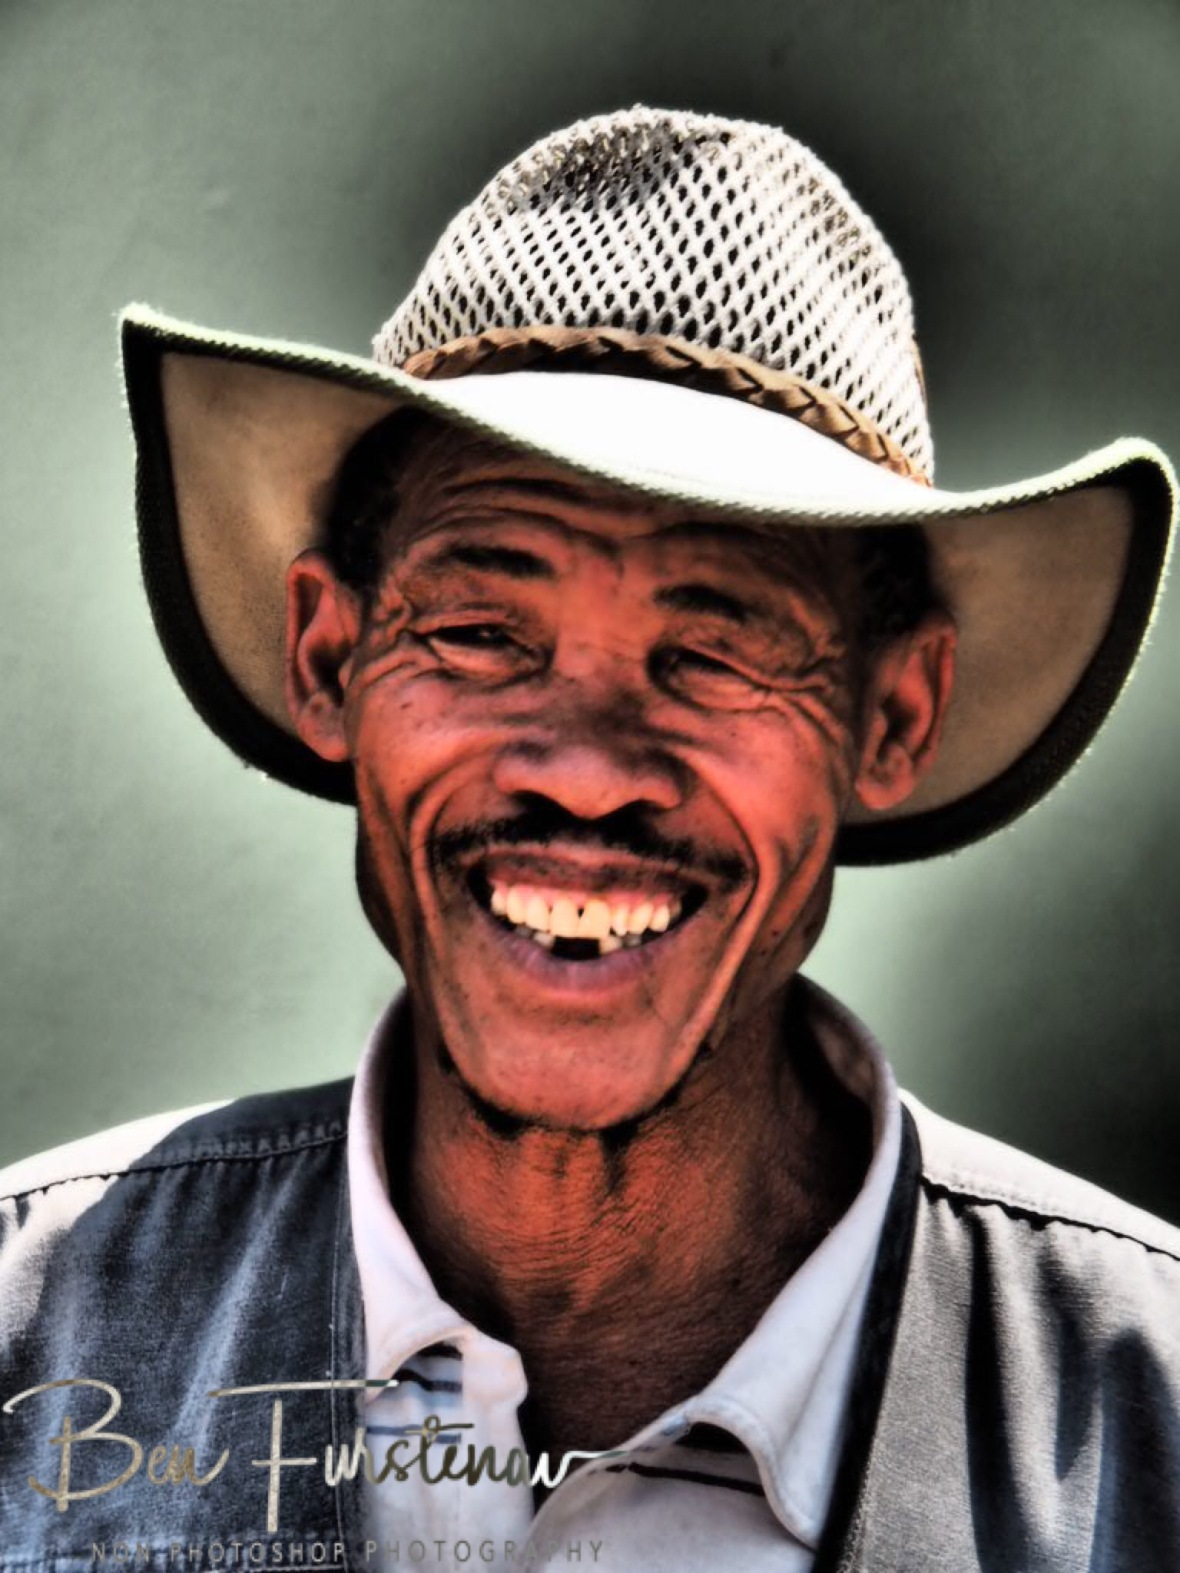 Happy bushman with oversized pants, Tsolido Hills, Kalahari desert, Botswana